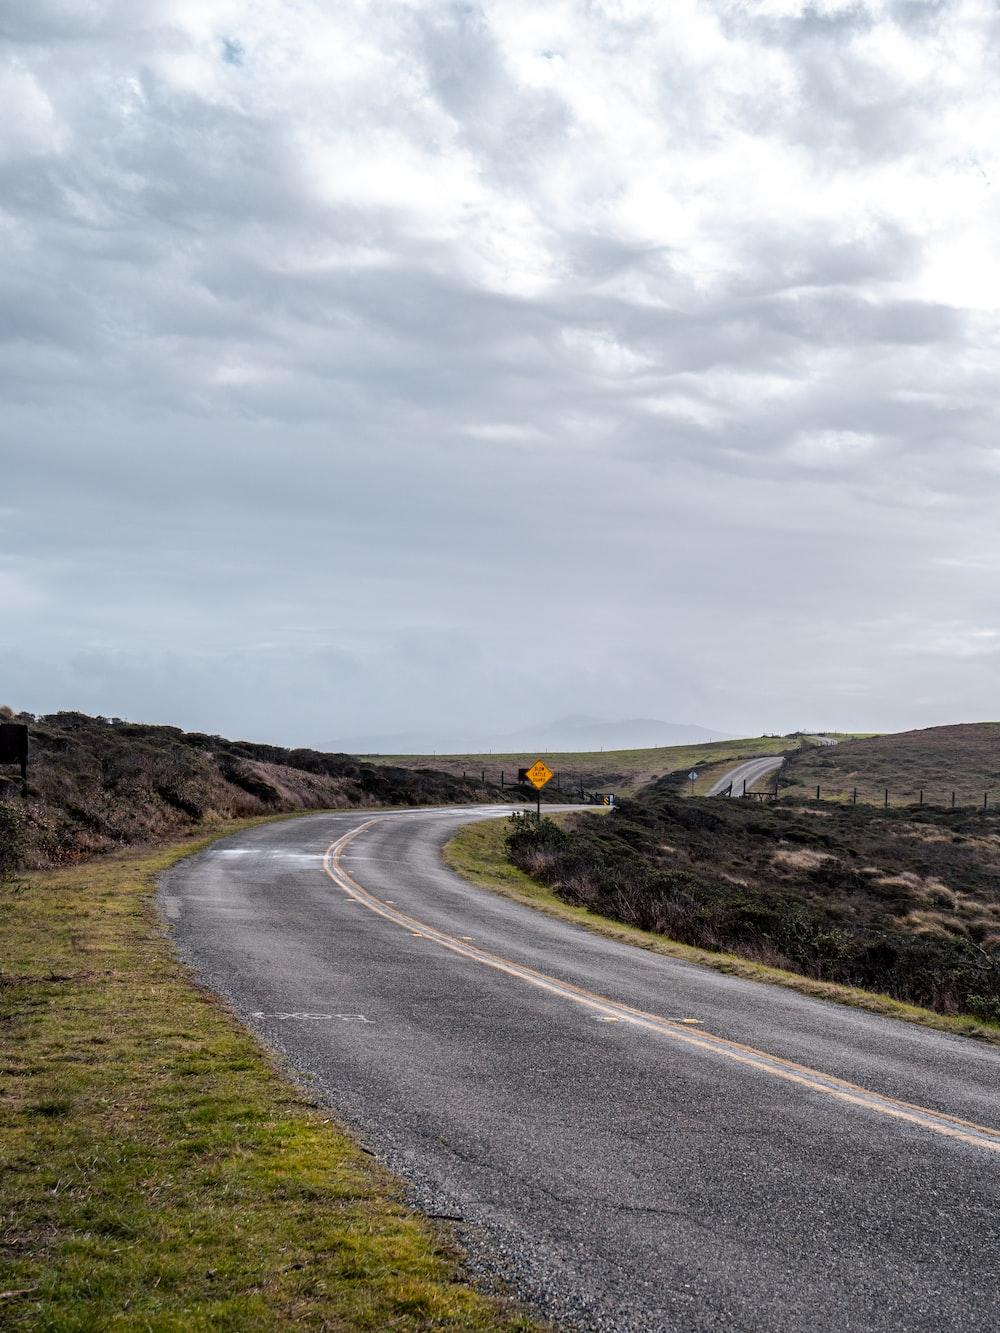 gray concrete road between green grass field under gray sky